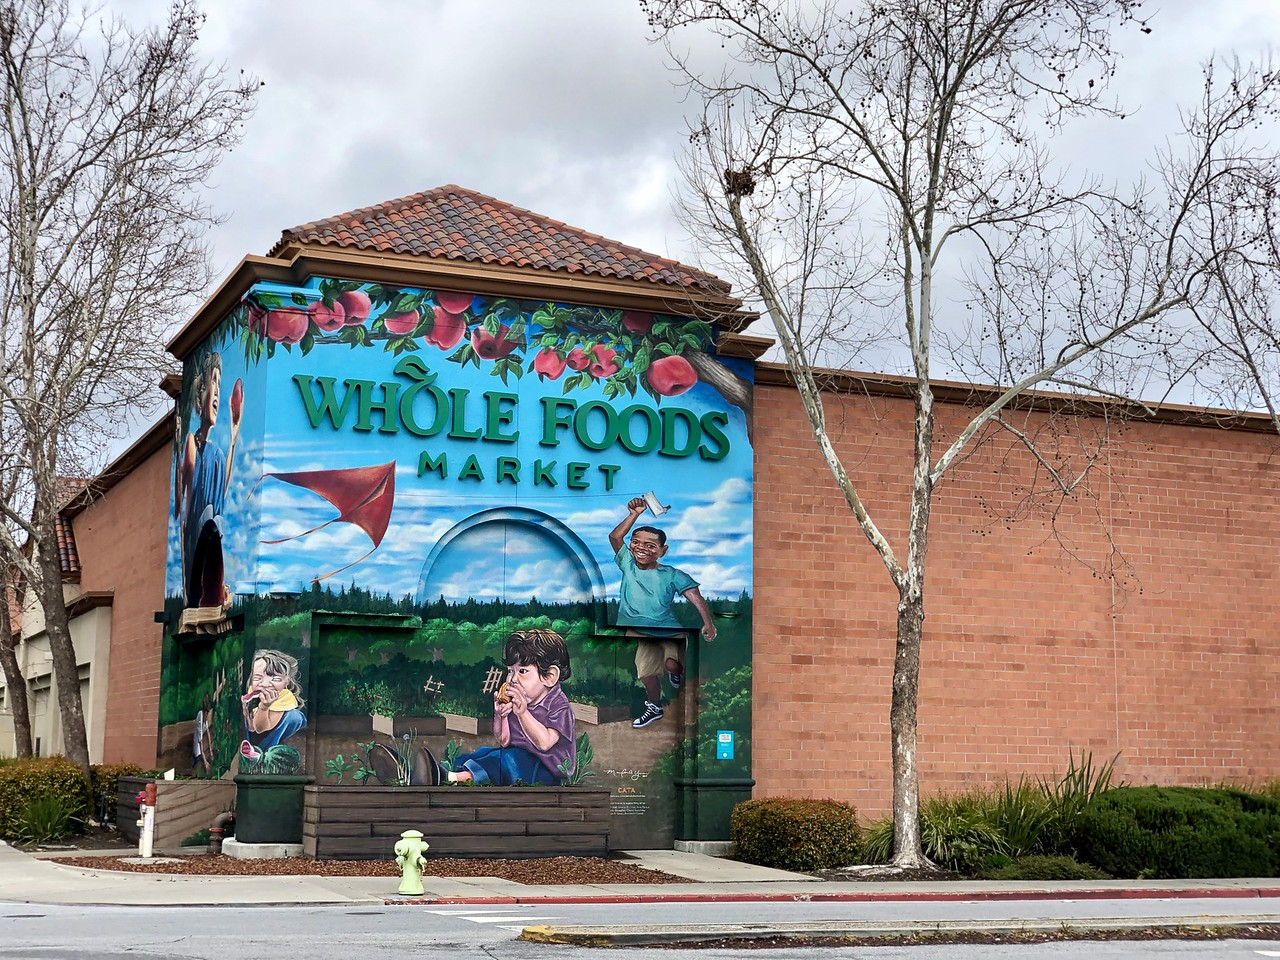 Whole Foods Market Grocery Store Redwood City Blu Skye Media-X2.jpg